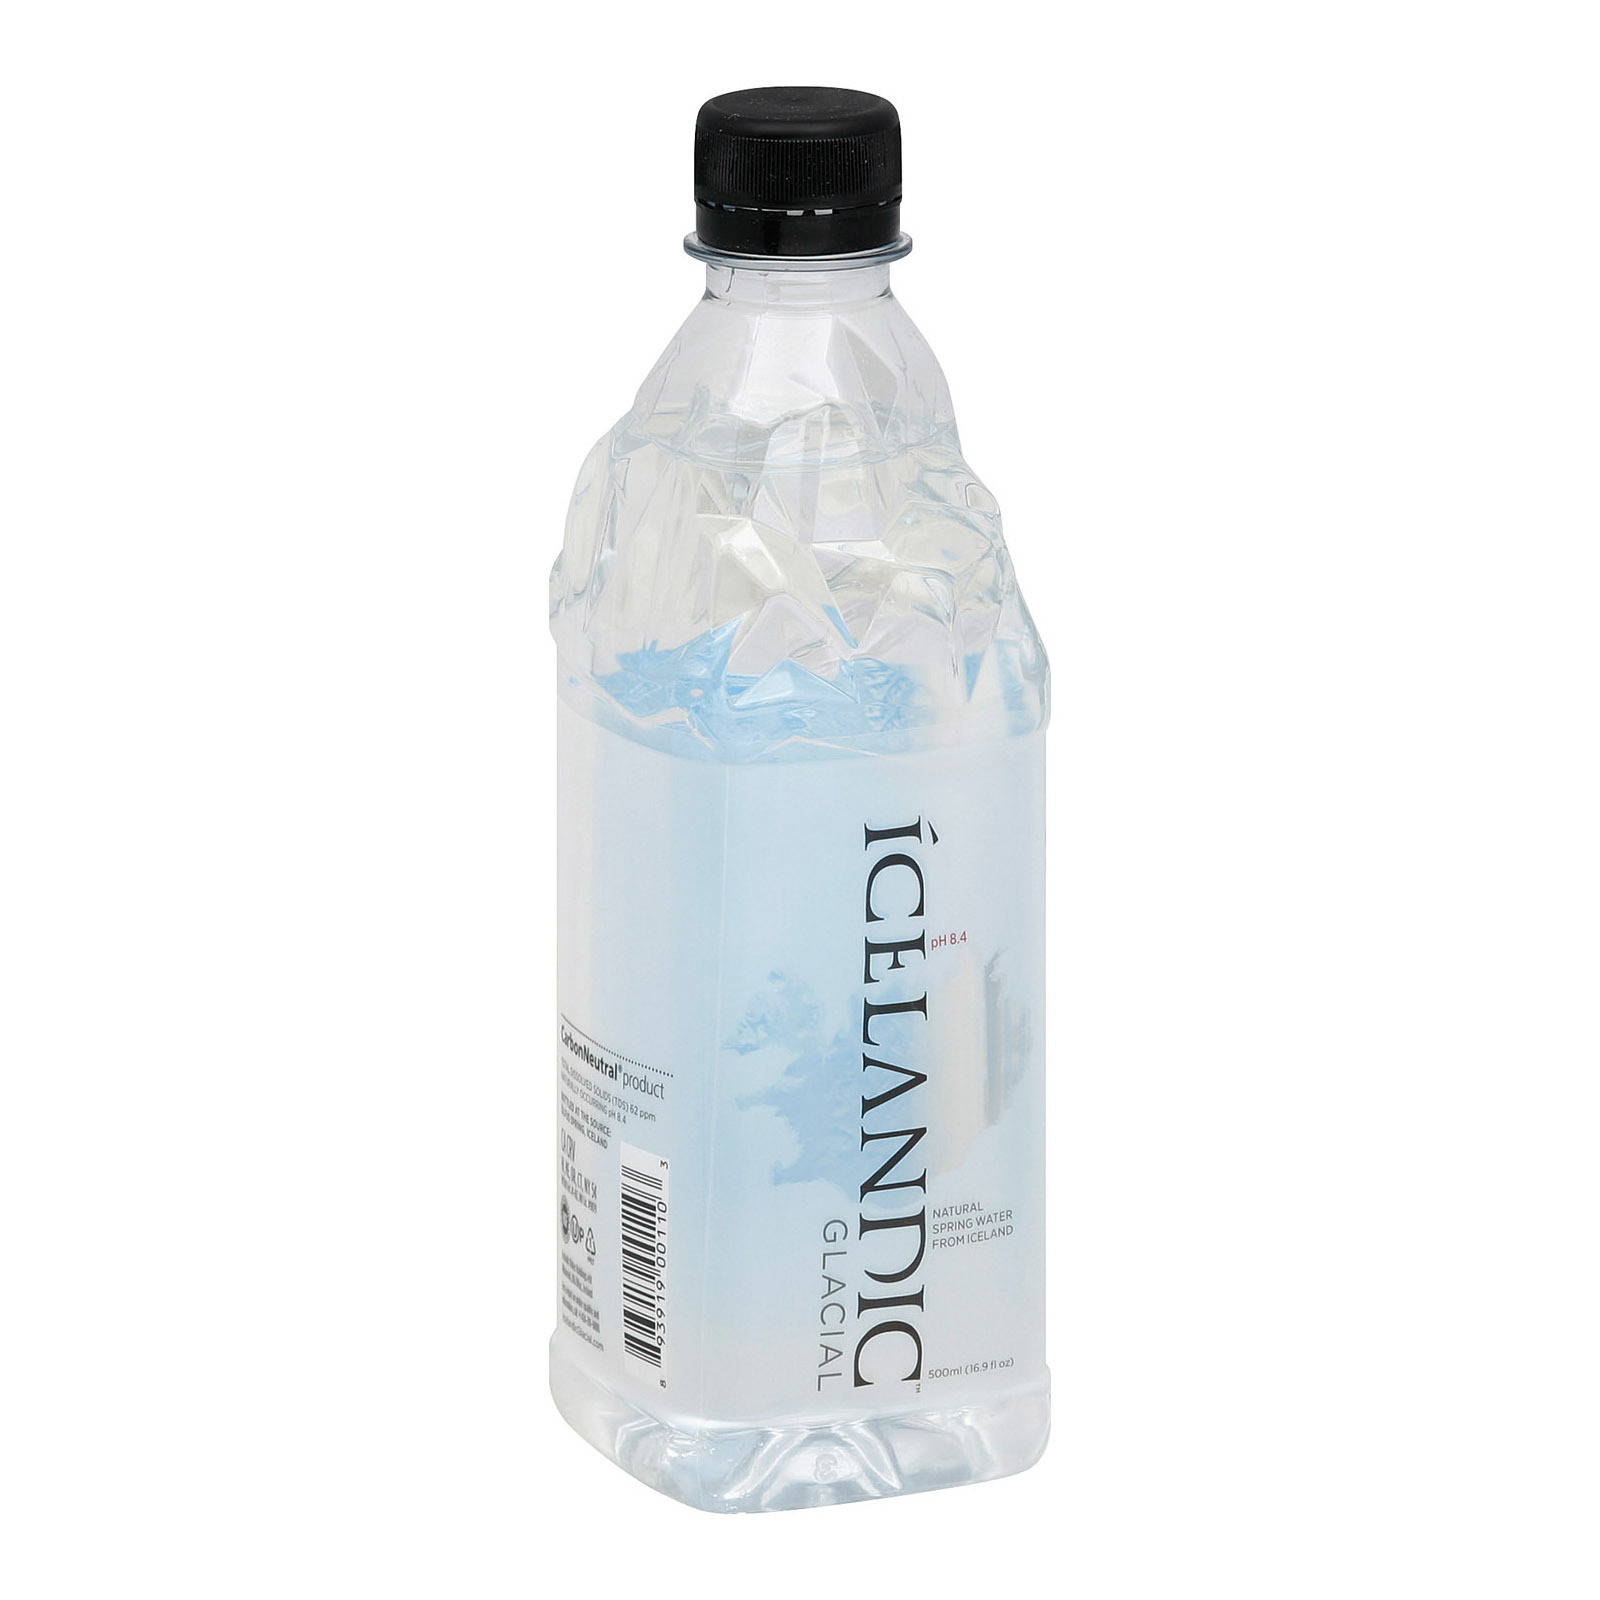 Icelandic Glacial Water, 16.9 Fl oz